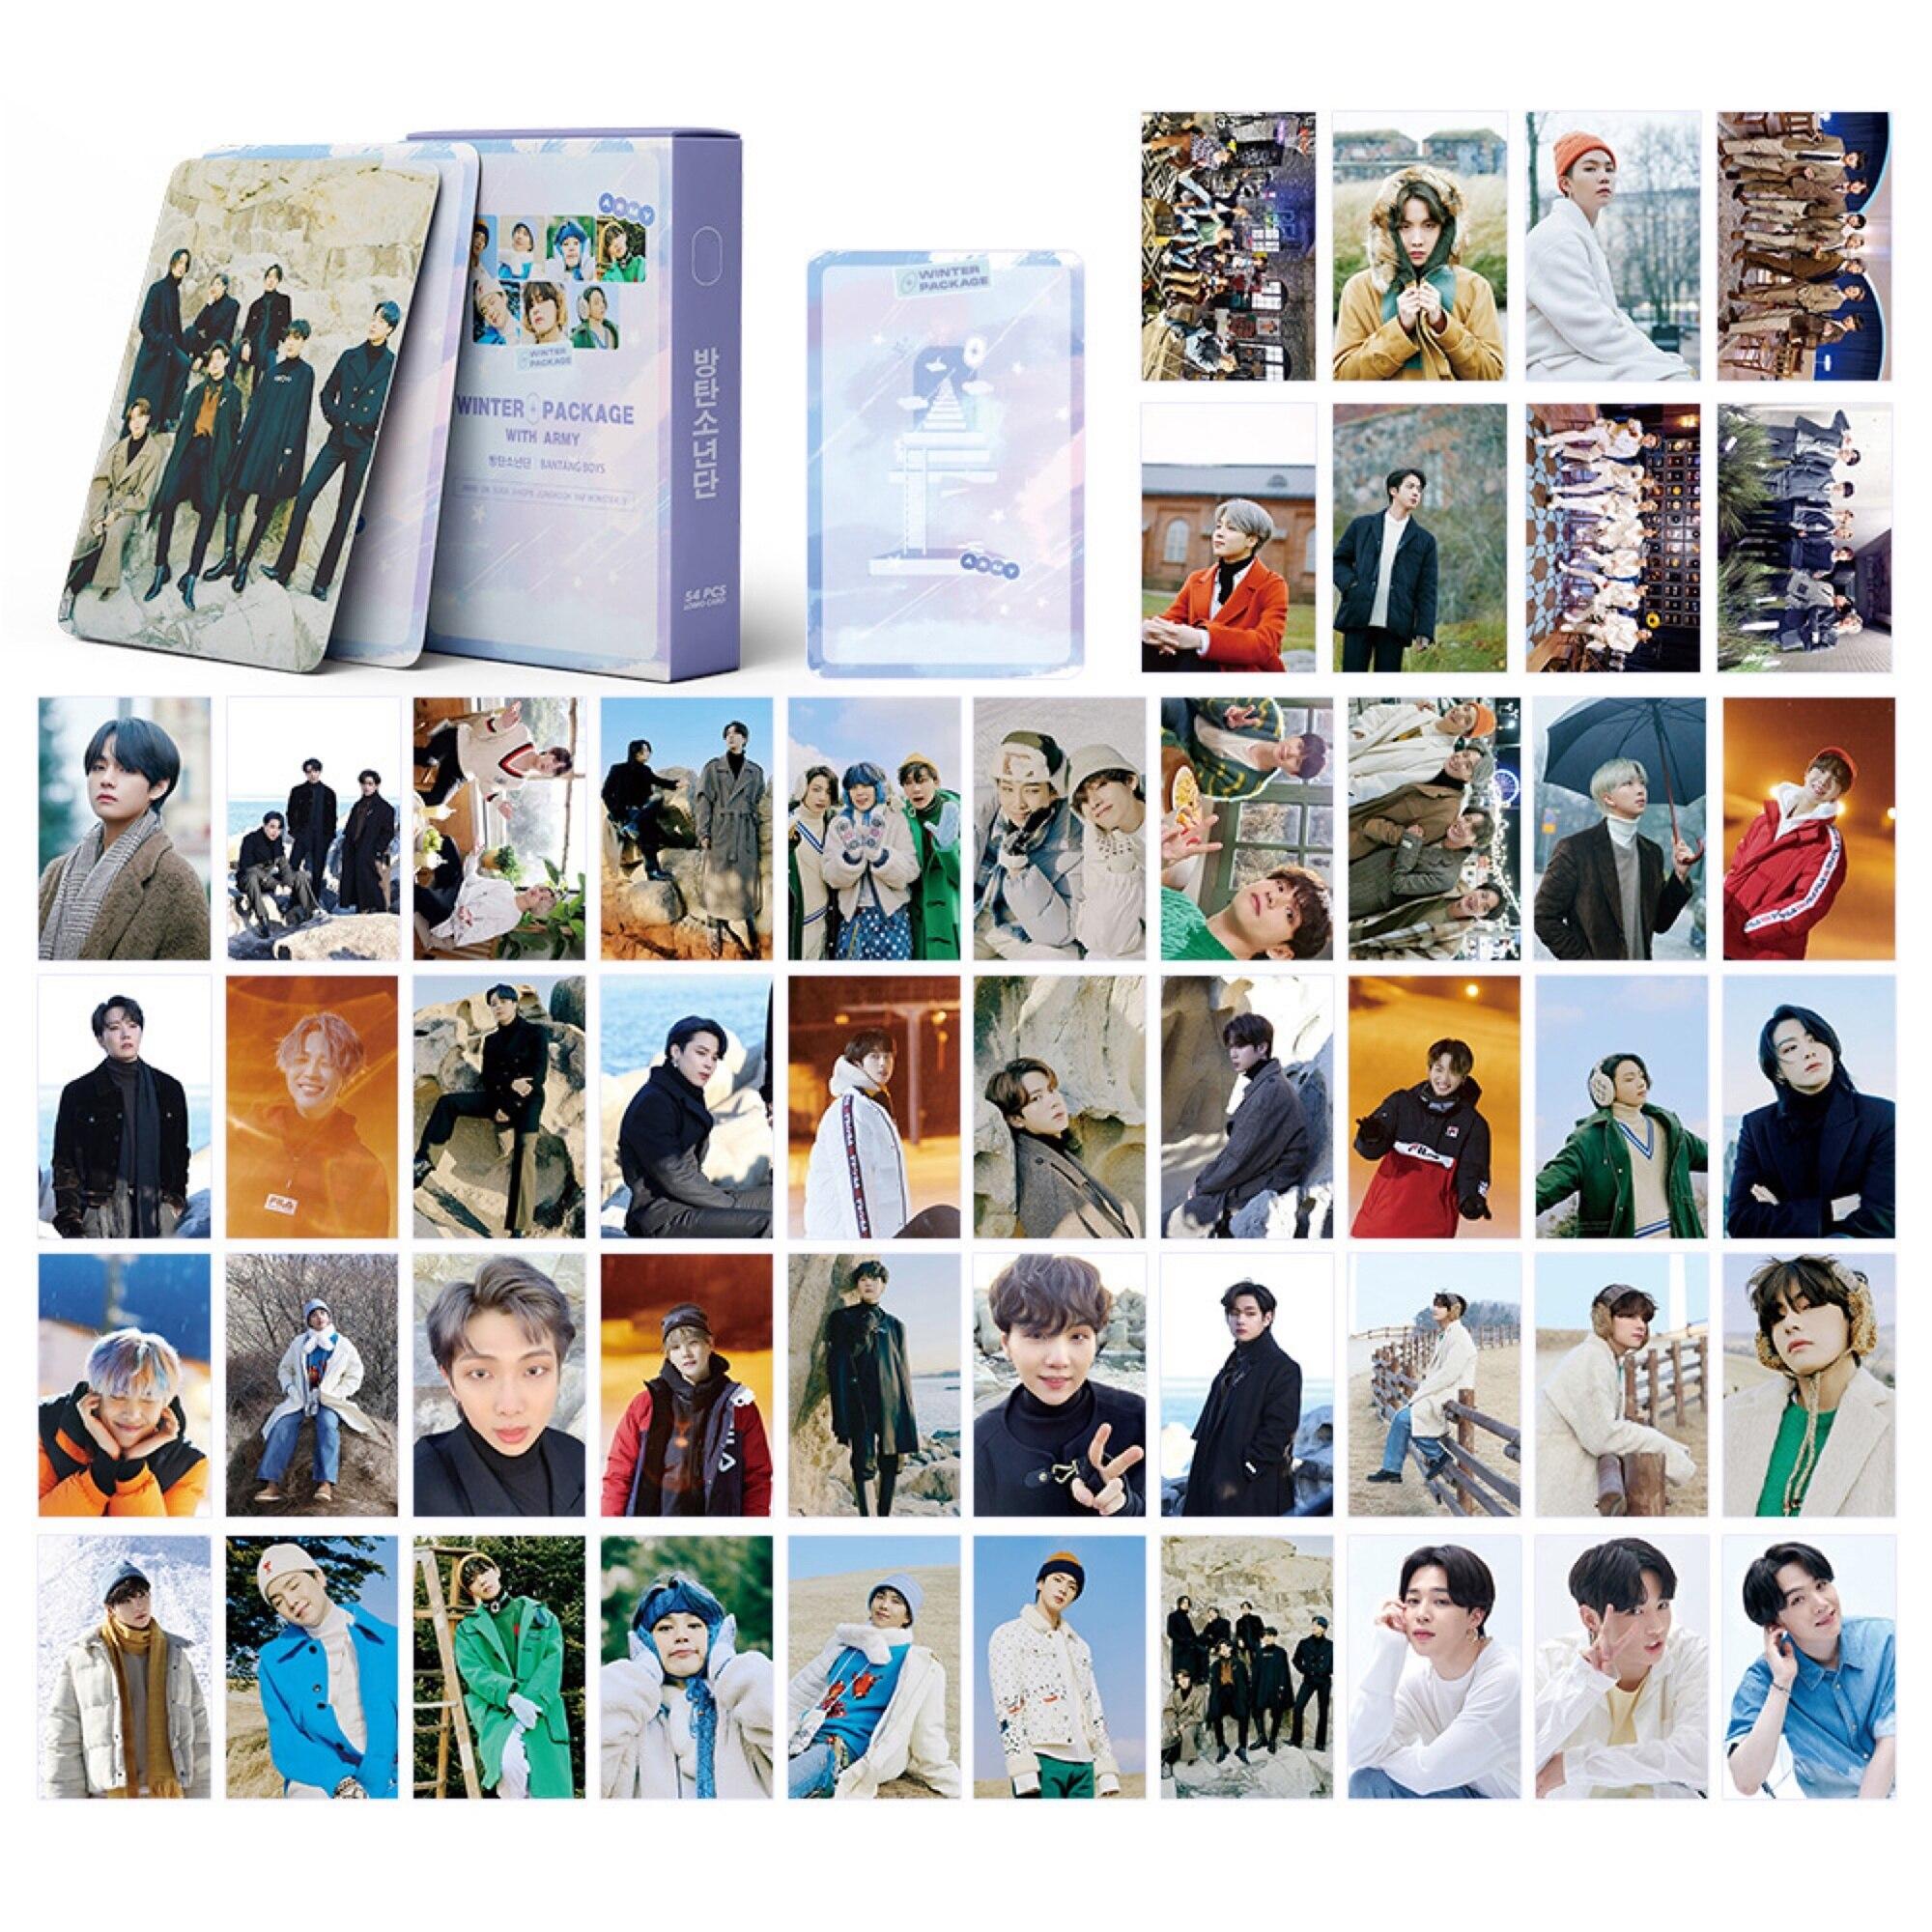 kpop lomo card bangtan boys album map of the soul persona member photocard set 30 cards 54pc KPOP Bangtan Boys New Album 2021 Winter Package LOMO Card MAP OF THE SOUL PERSONA Photocard Paper Cards JK SUGA V JIN JIMIN